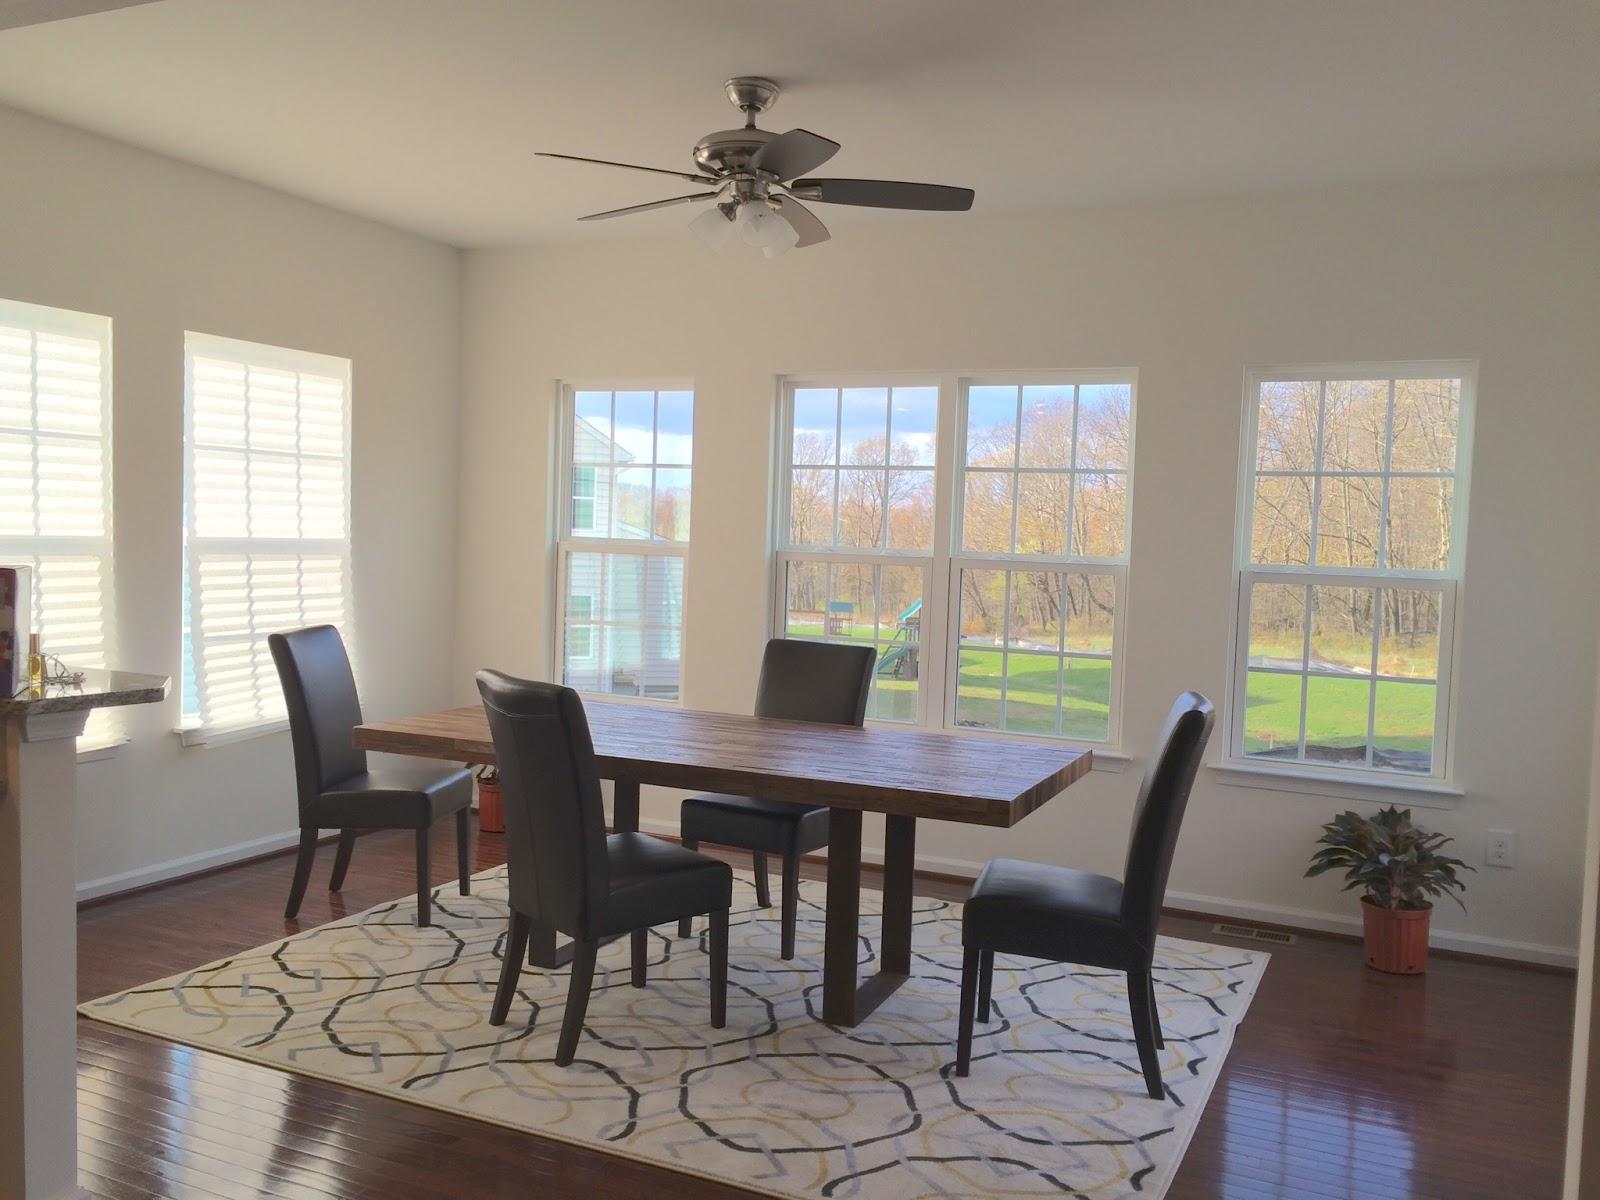 Morning Room Furniture Homesfeed